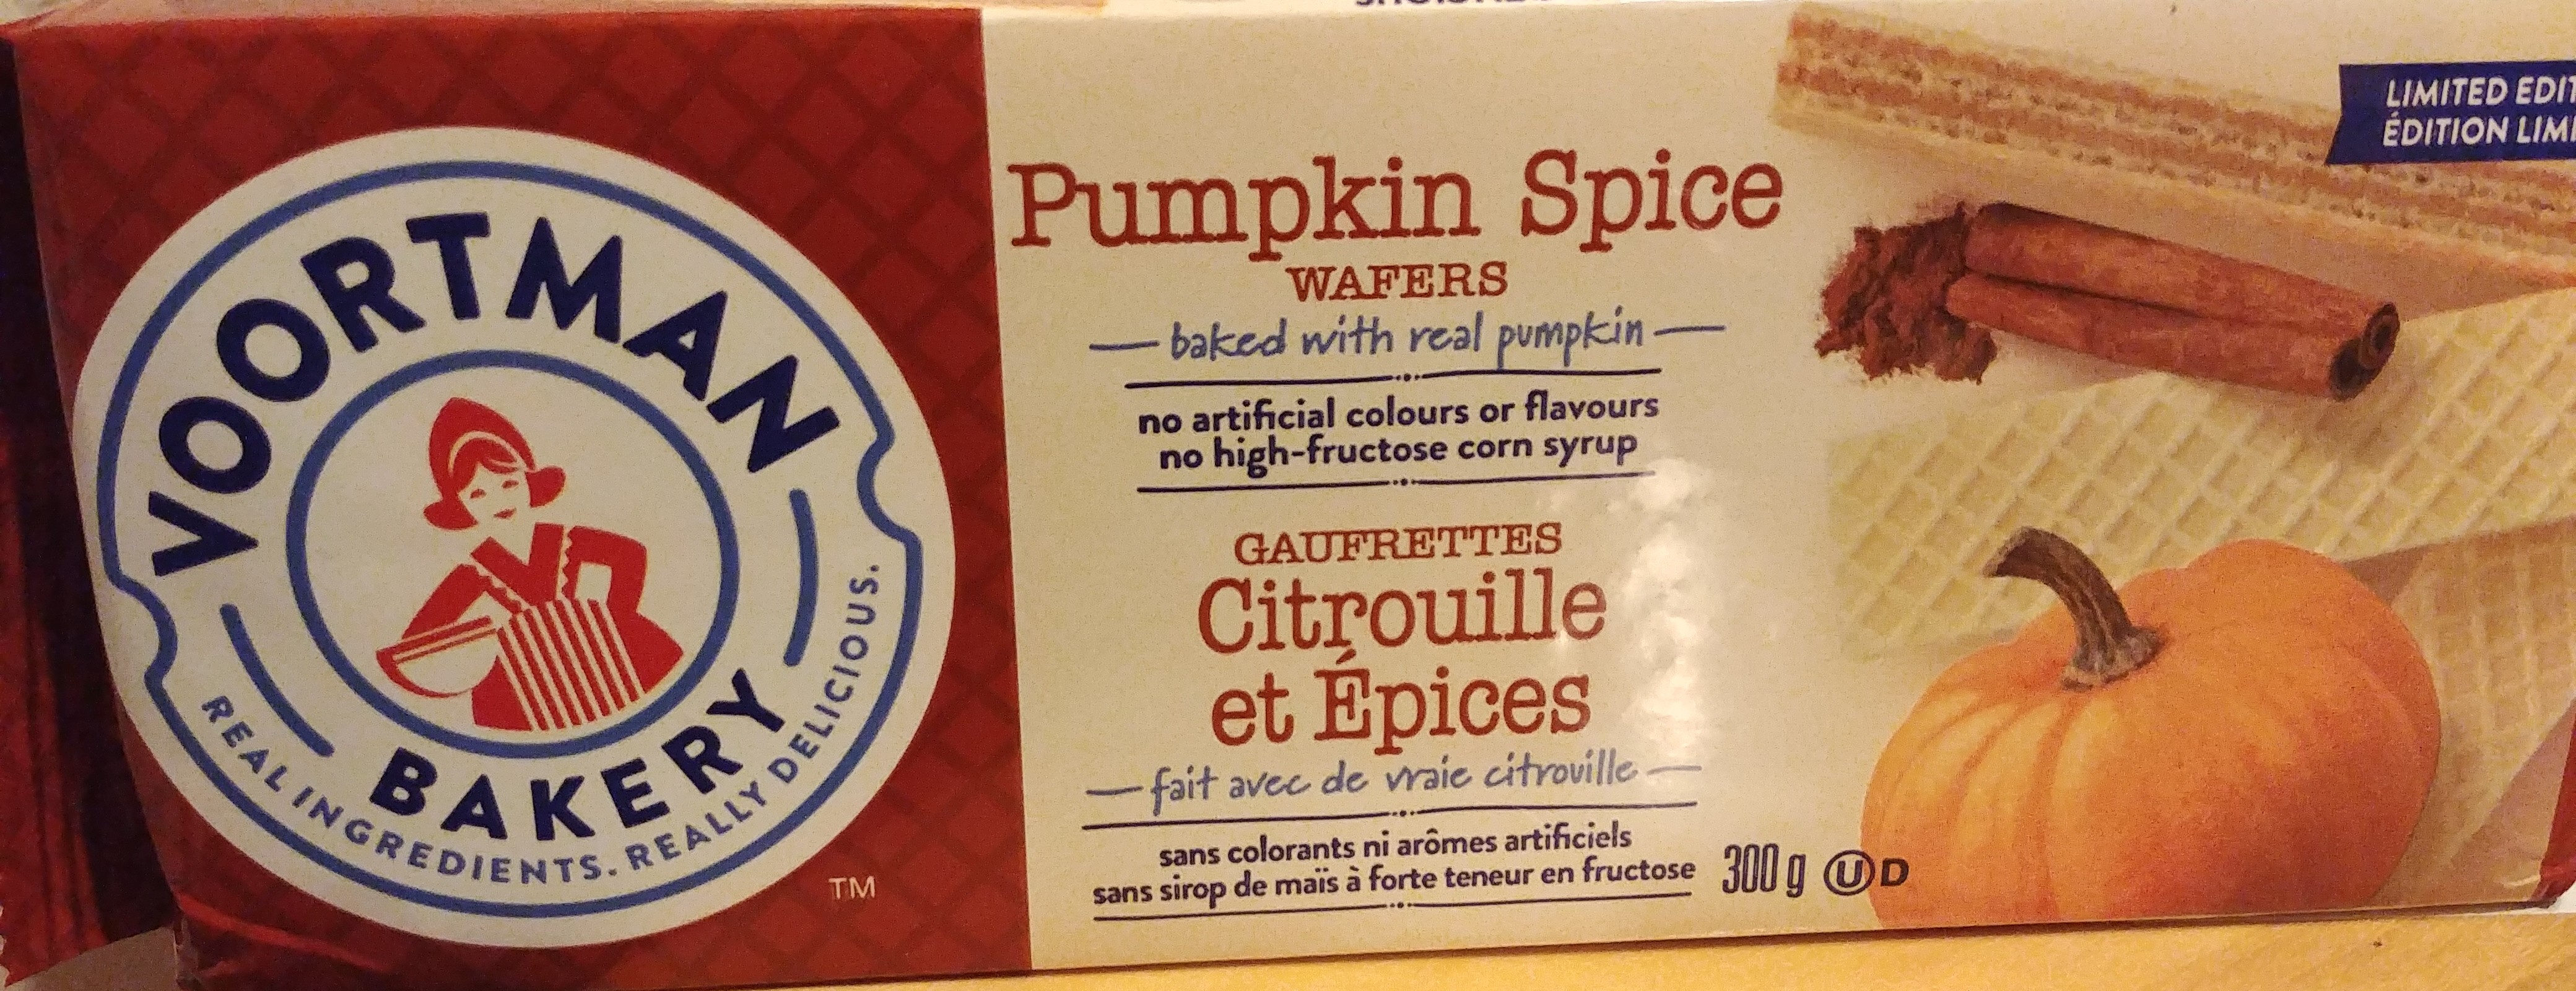 Pumpkin spice wafers, pumpkin spice - Produit - fr